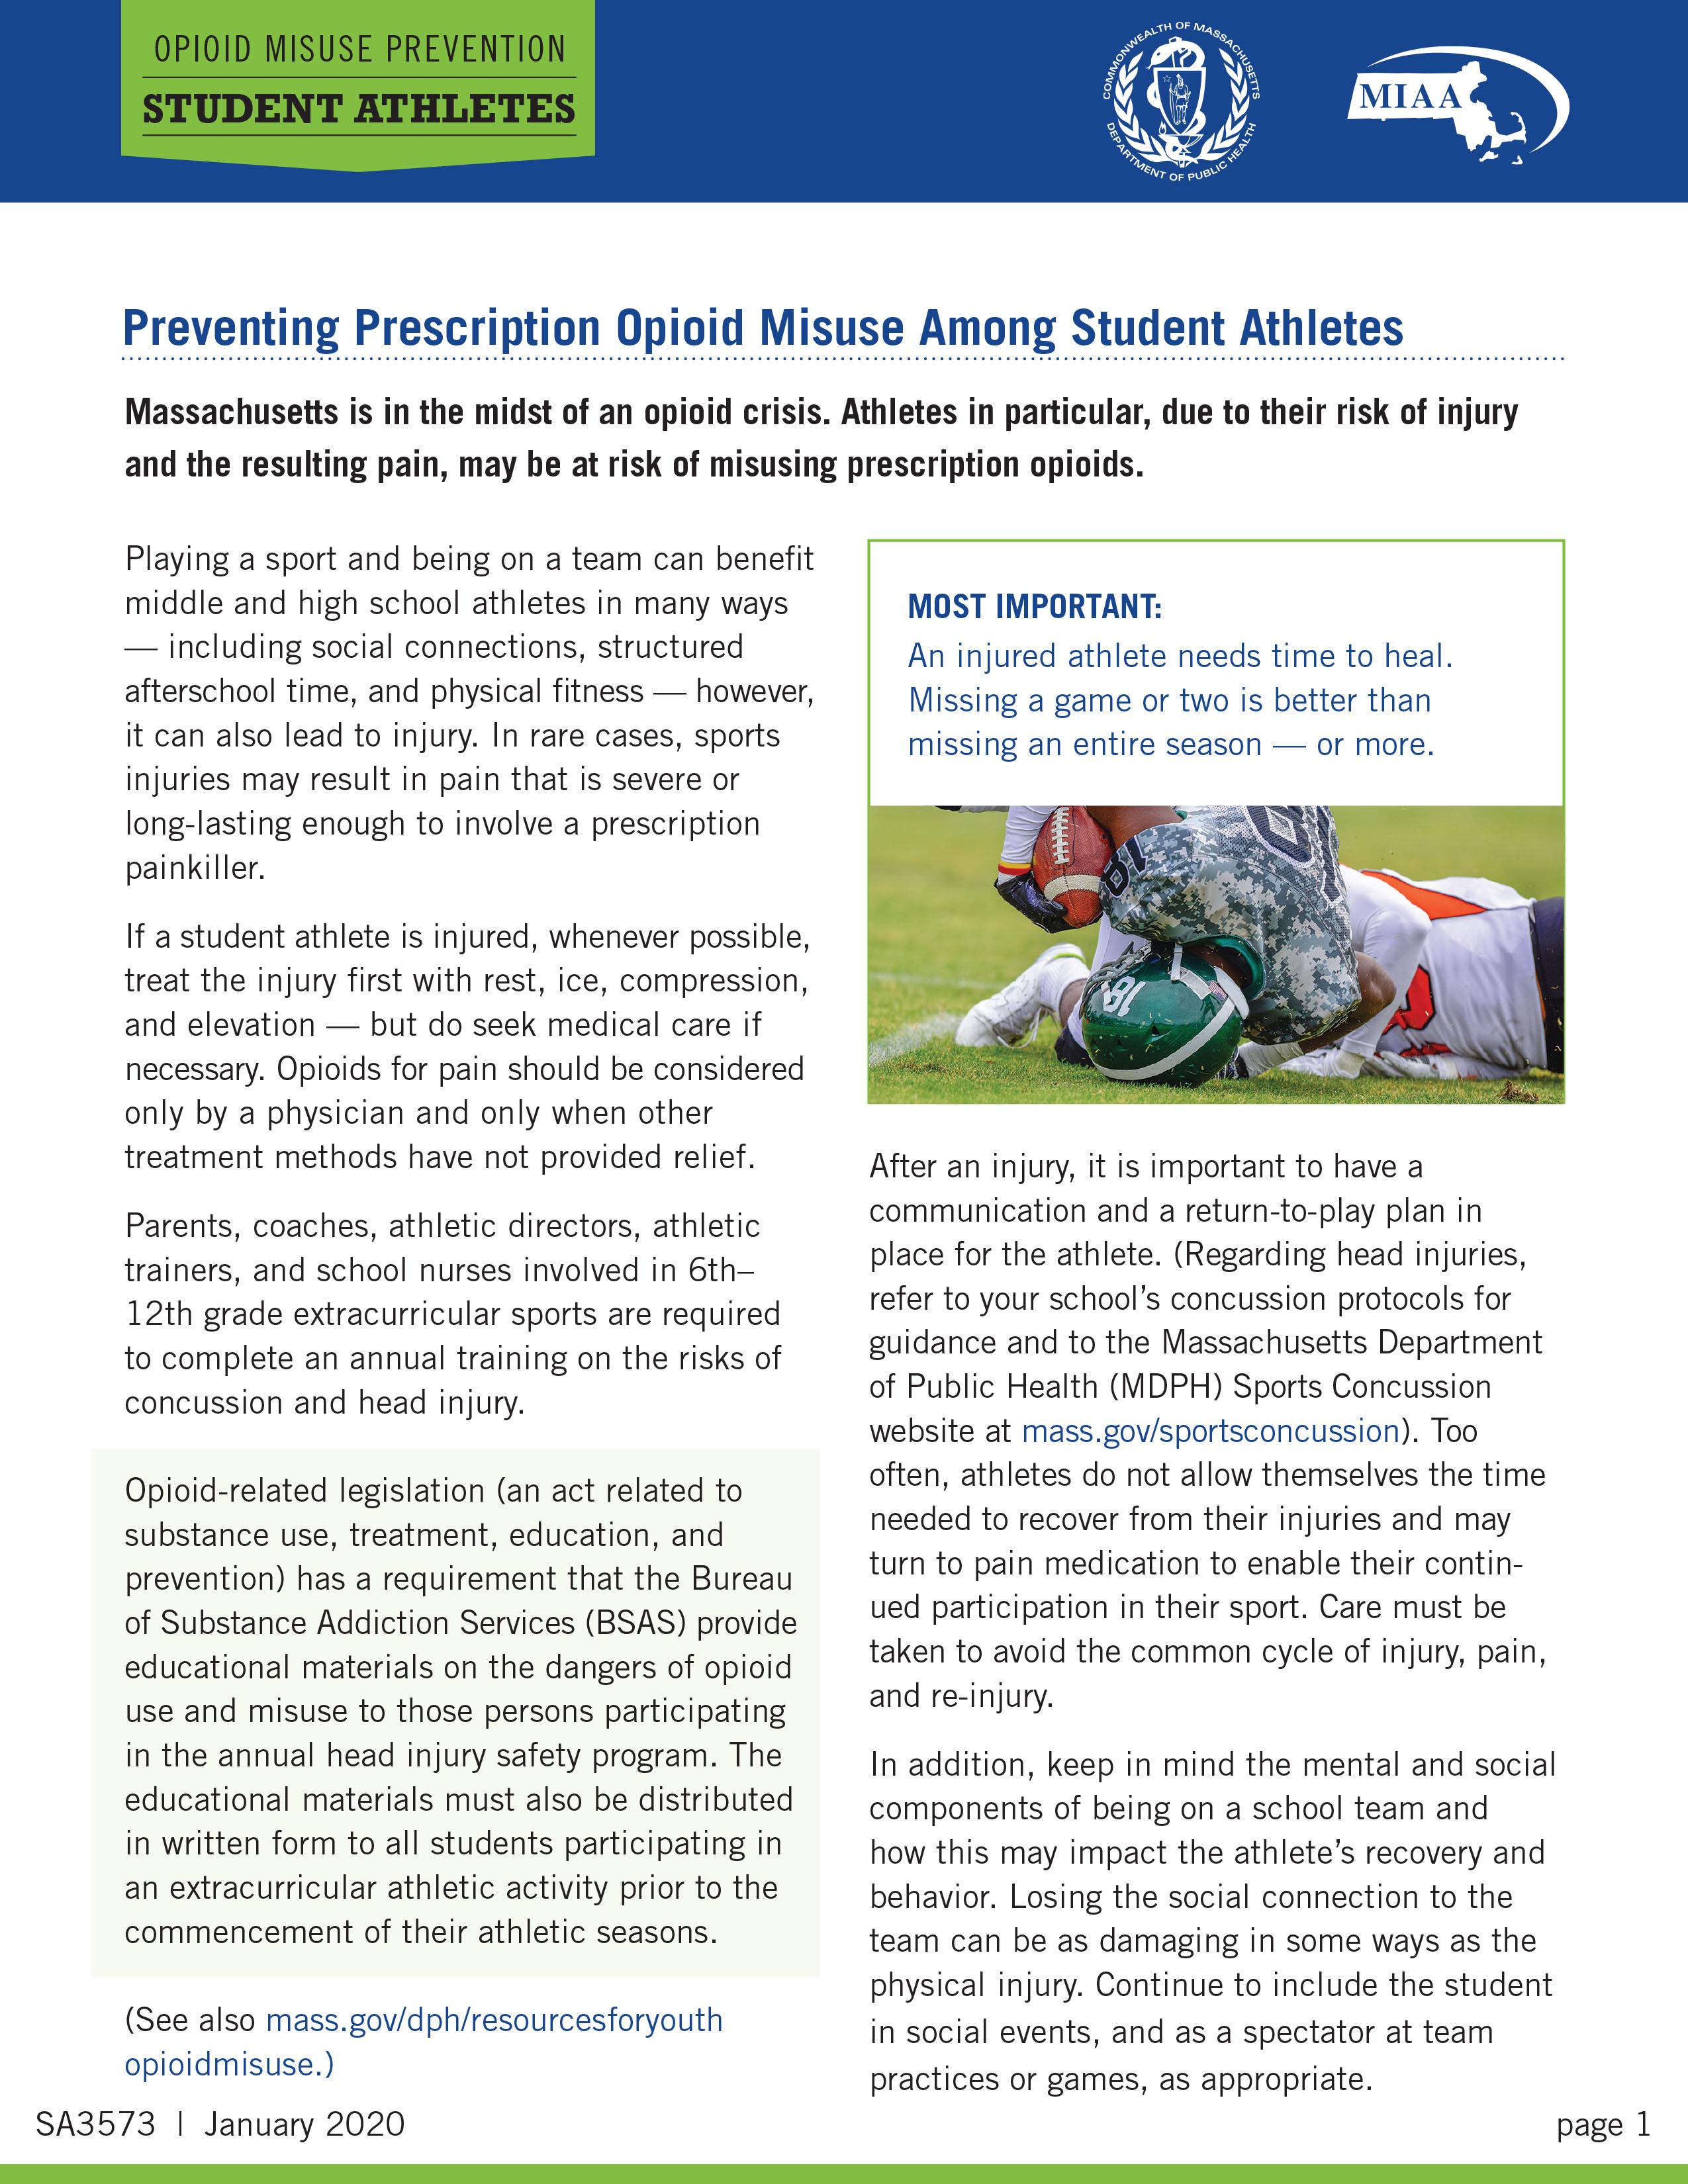 Preventing Prescription Opioid Misuse Among Student